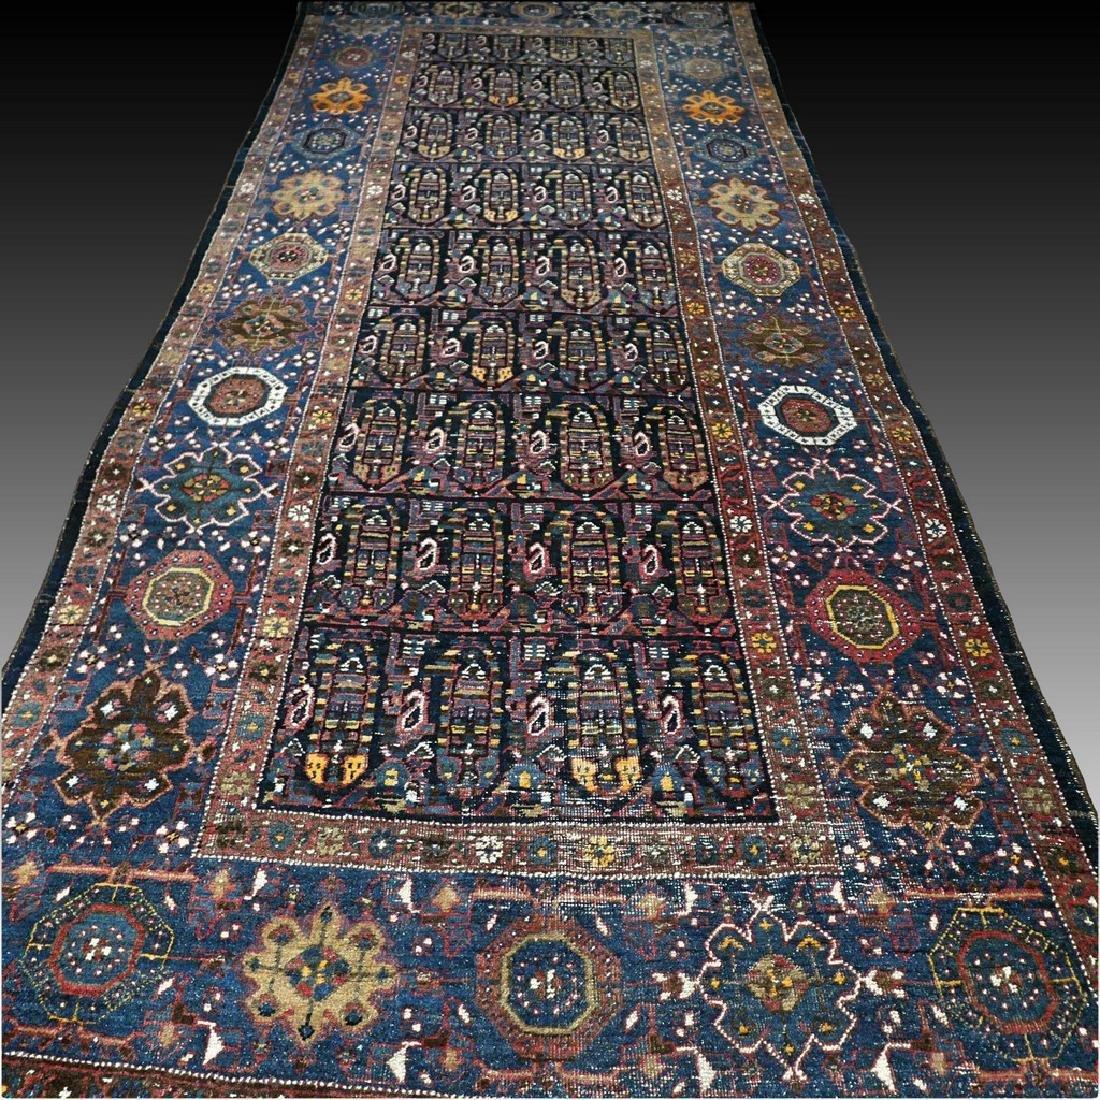 10.1x4.3 Antique Armenian boteh Kazak rug - 1880s - - 2